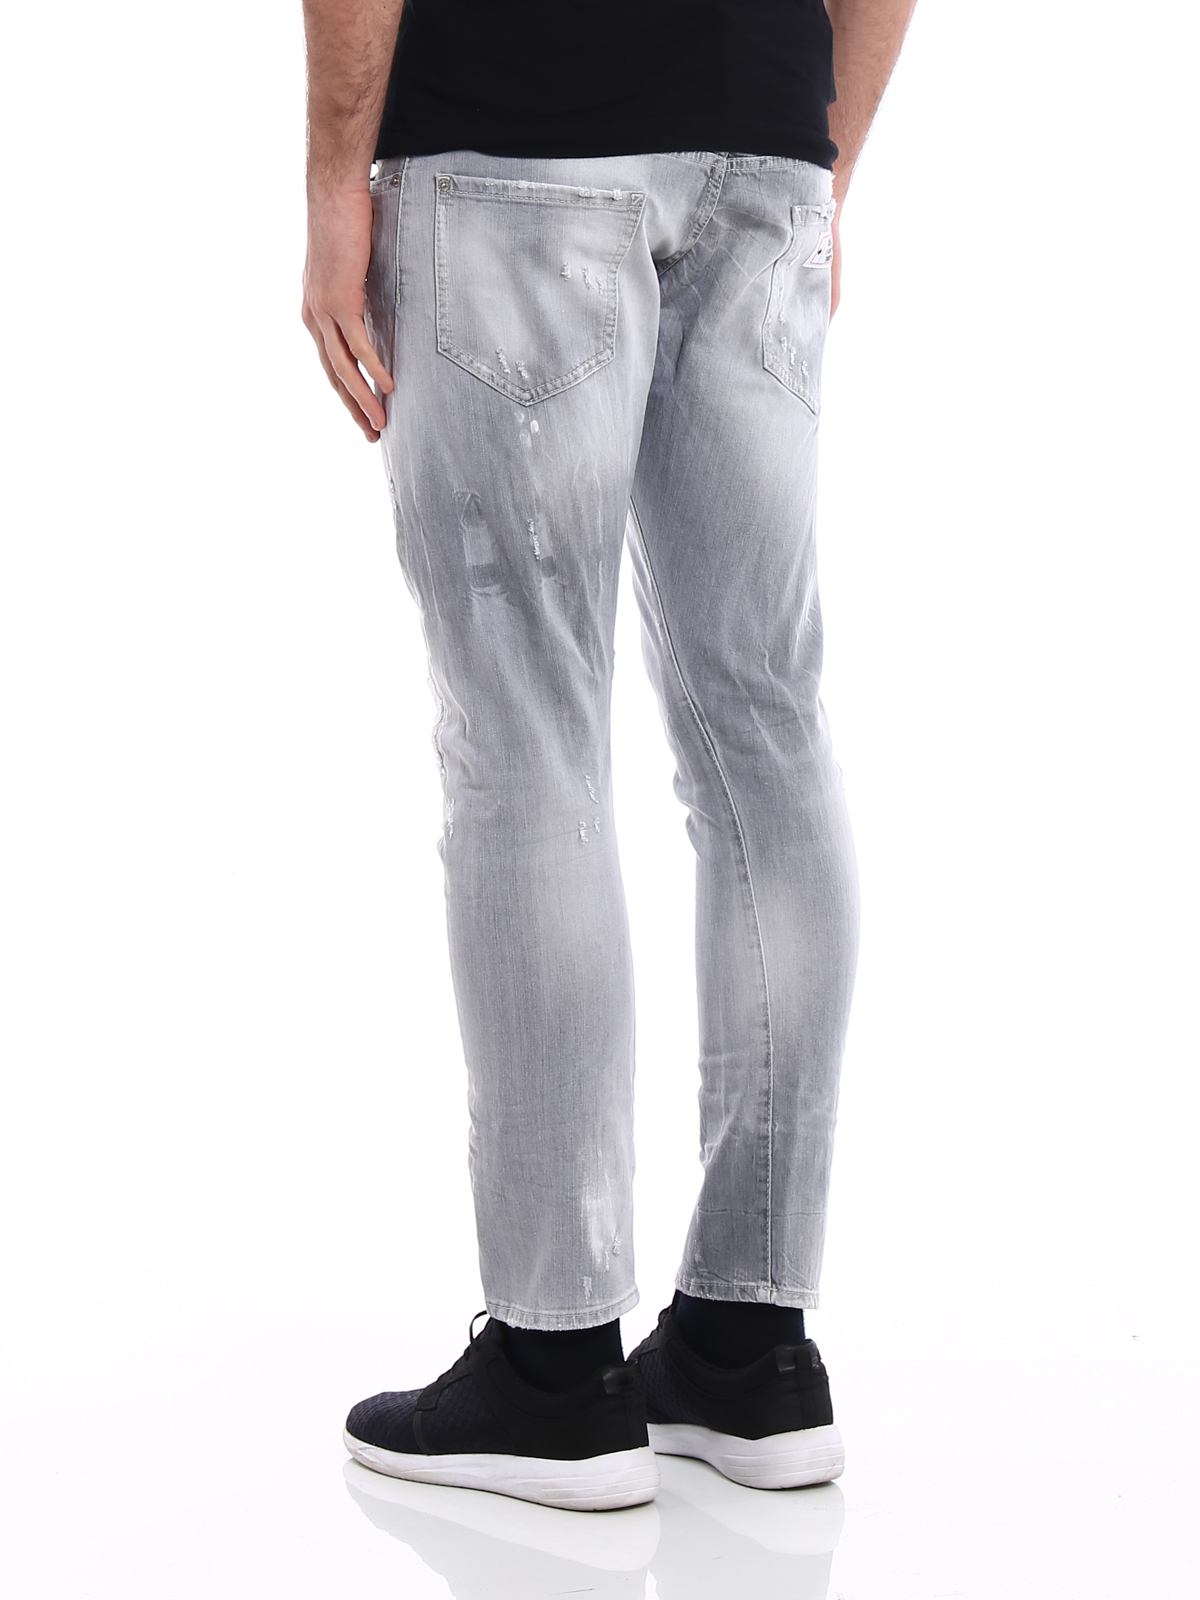 Sexy Twist light grey denim jeans shop online: Dsquared2